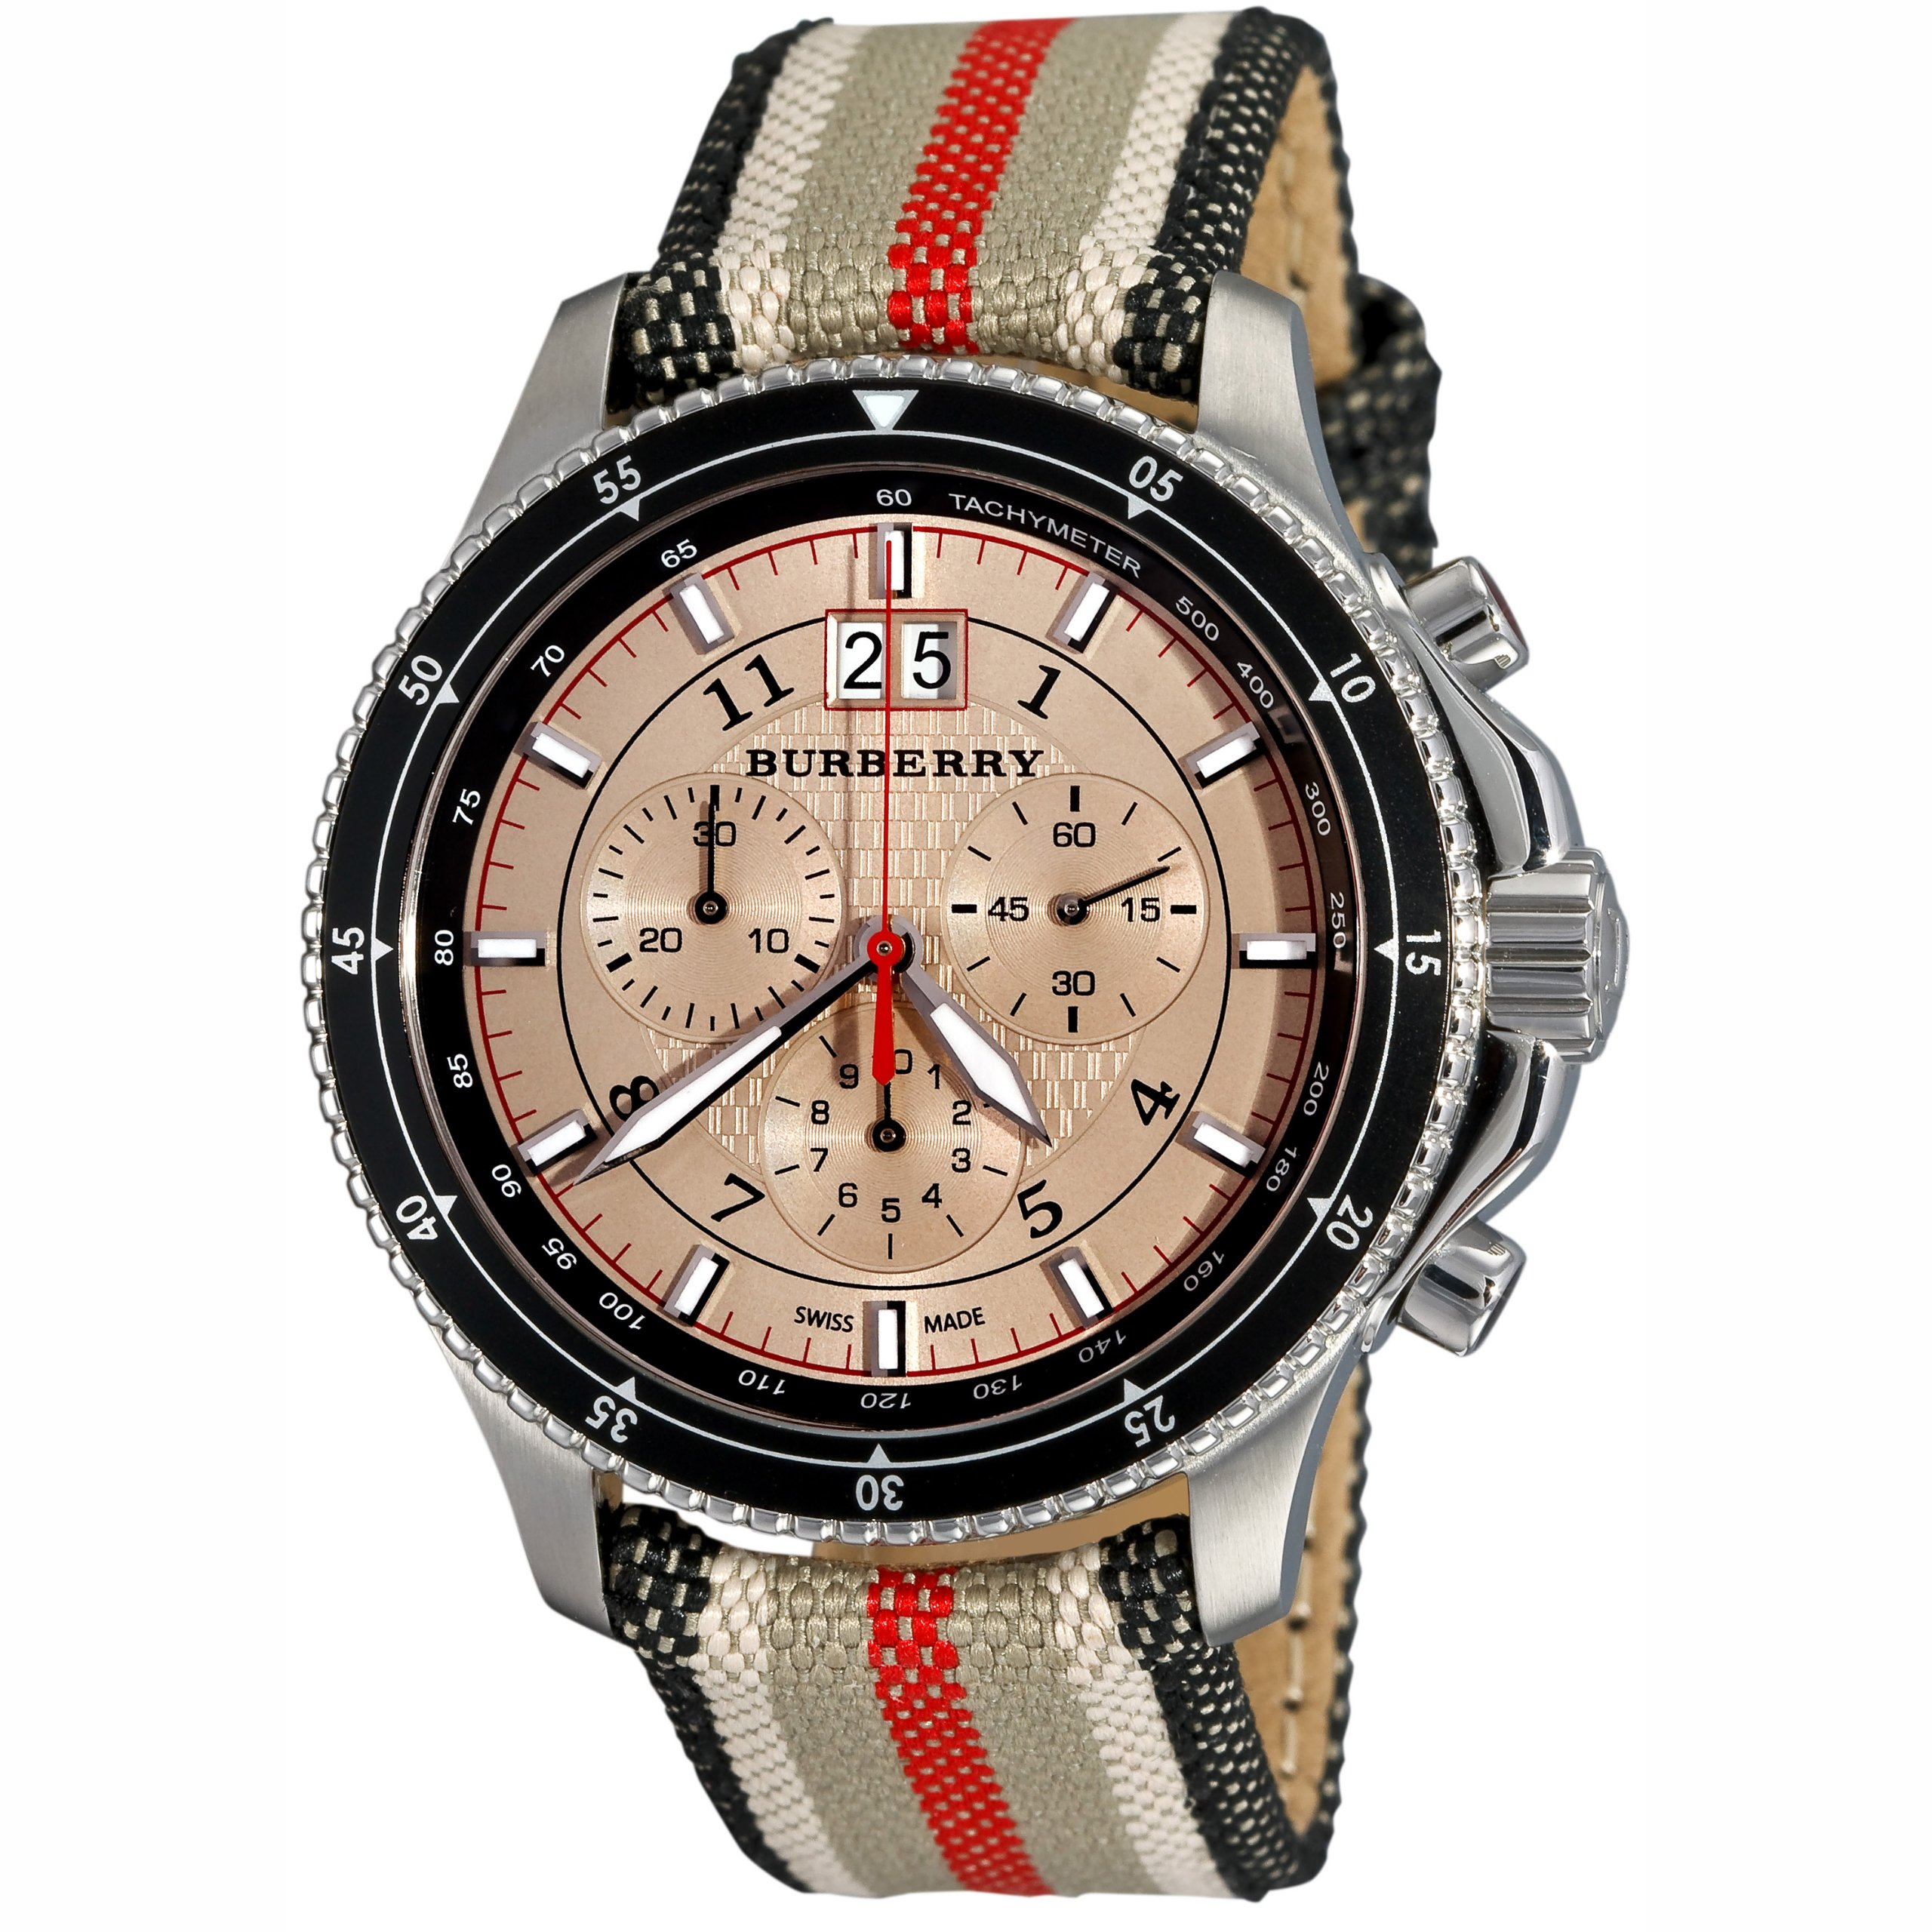 Burberry Men's Watches Endurance BU7600 - WW